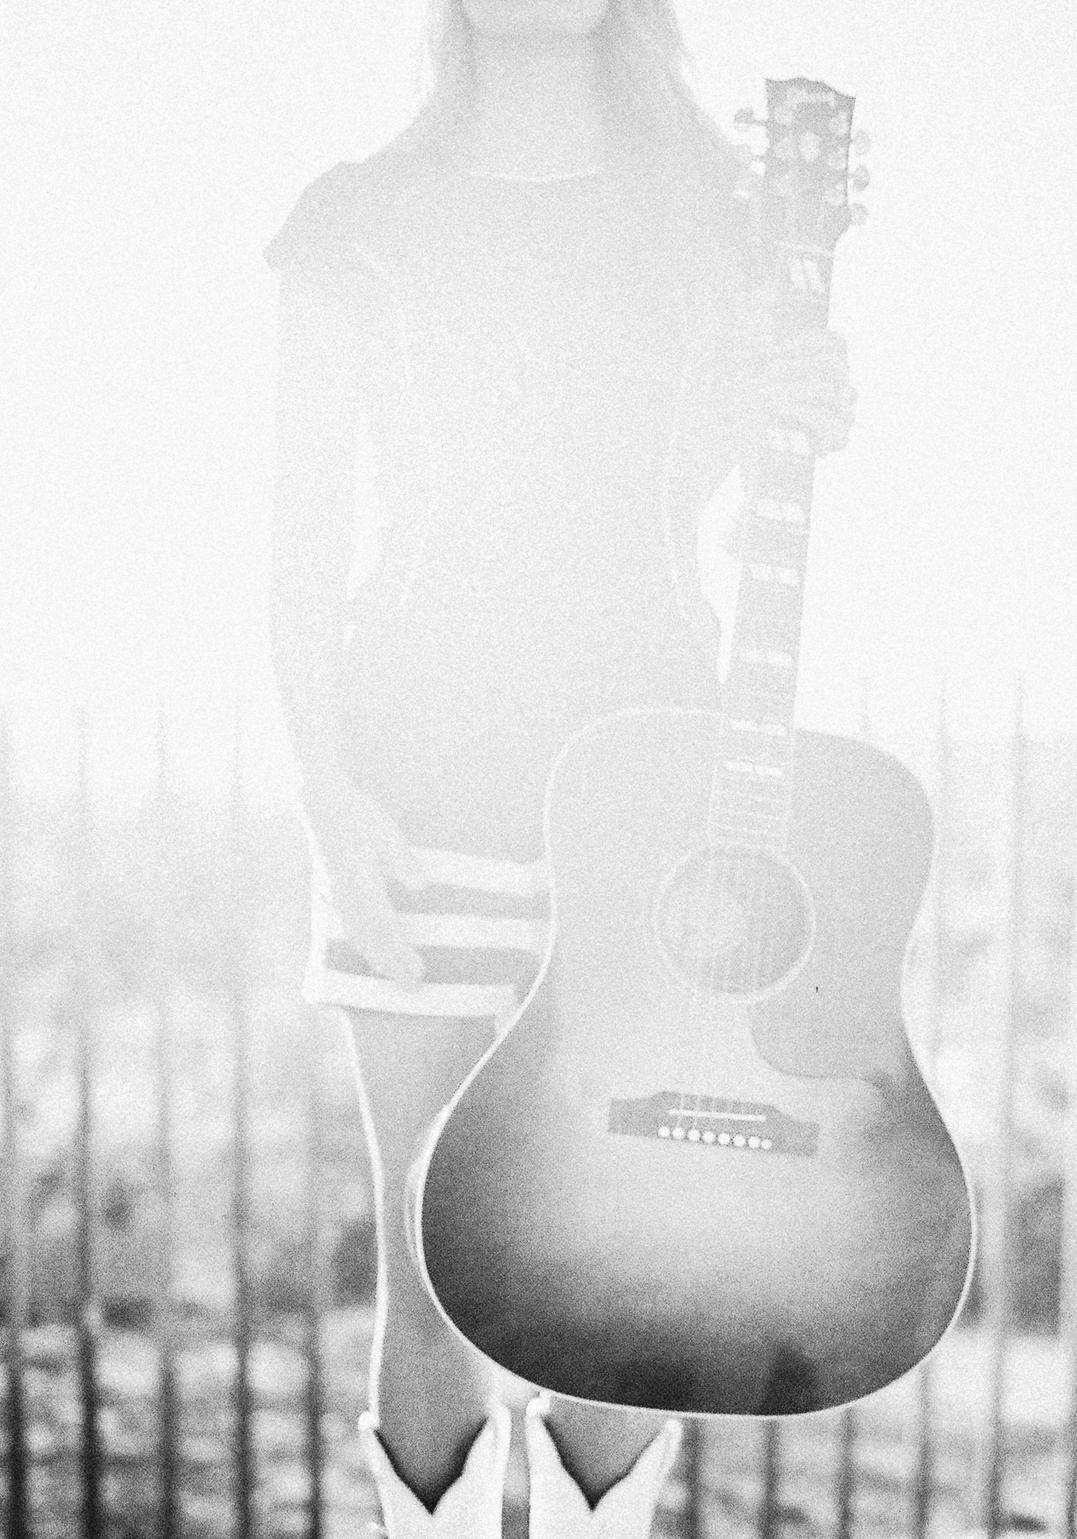 natalie_watson_musician_headshots_er_102.jpg